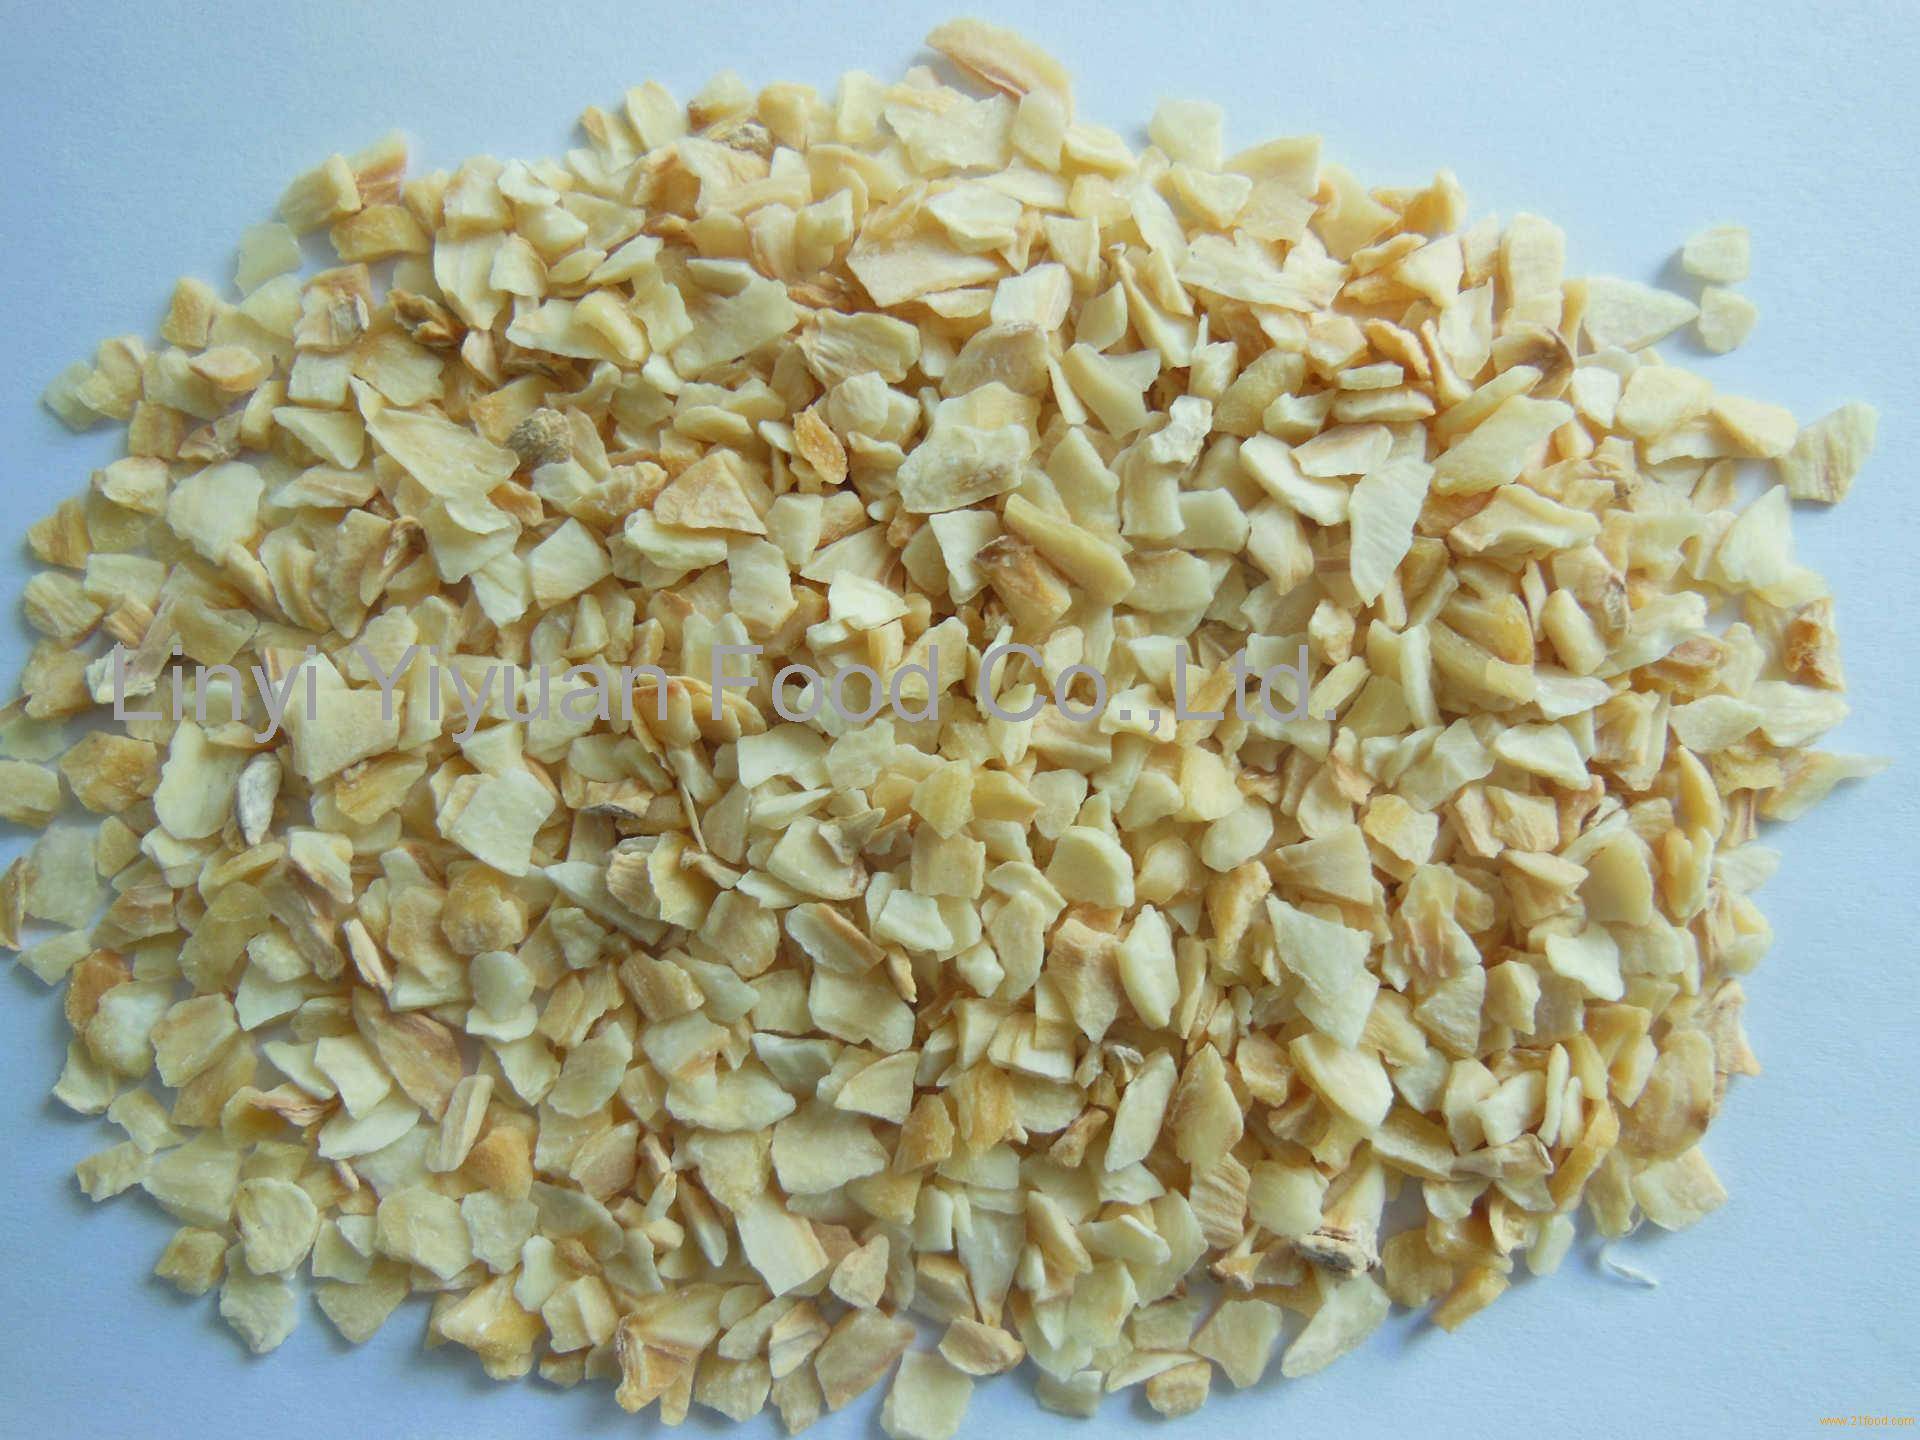 First class garlic granule without root material garlic granule pure white garlic